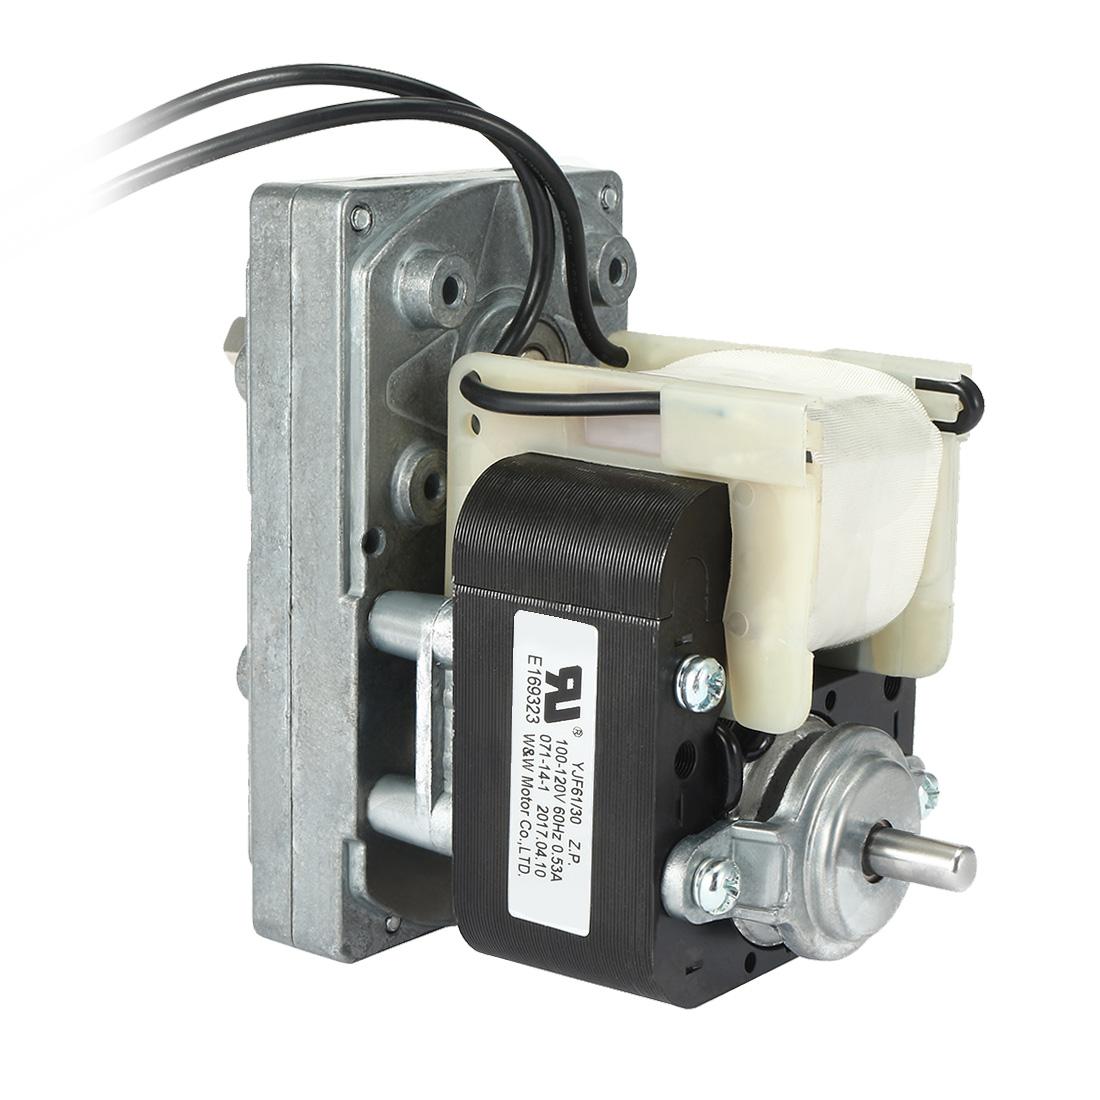 FC-YJ61 AC100V-120V 60Hz 76RPM CW Shaded Pole Motor Universal Geared Motor